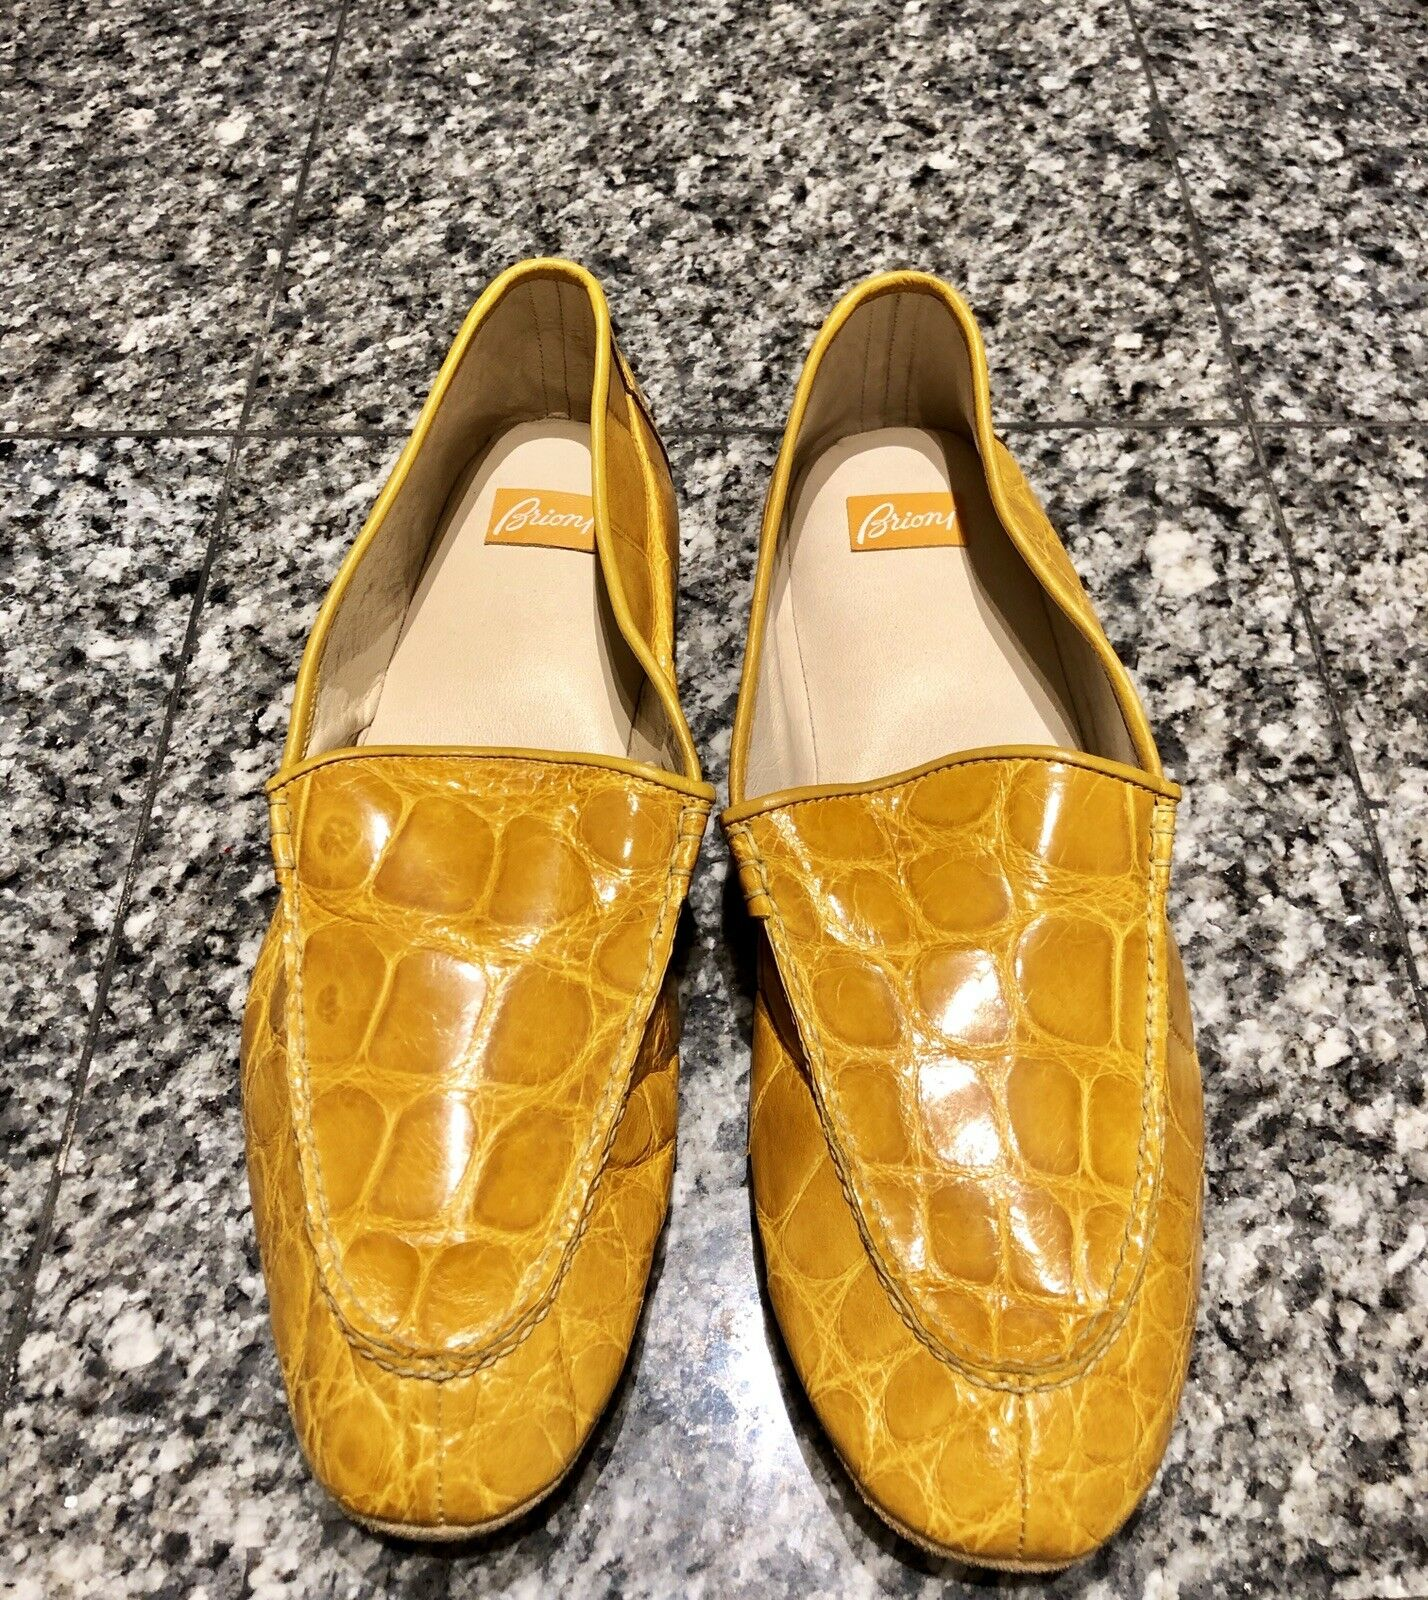 Brioni Yellow Crocodile Men's Slippers shoes